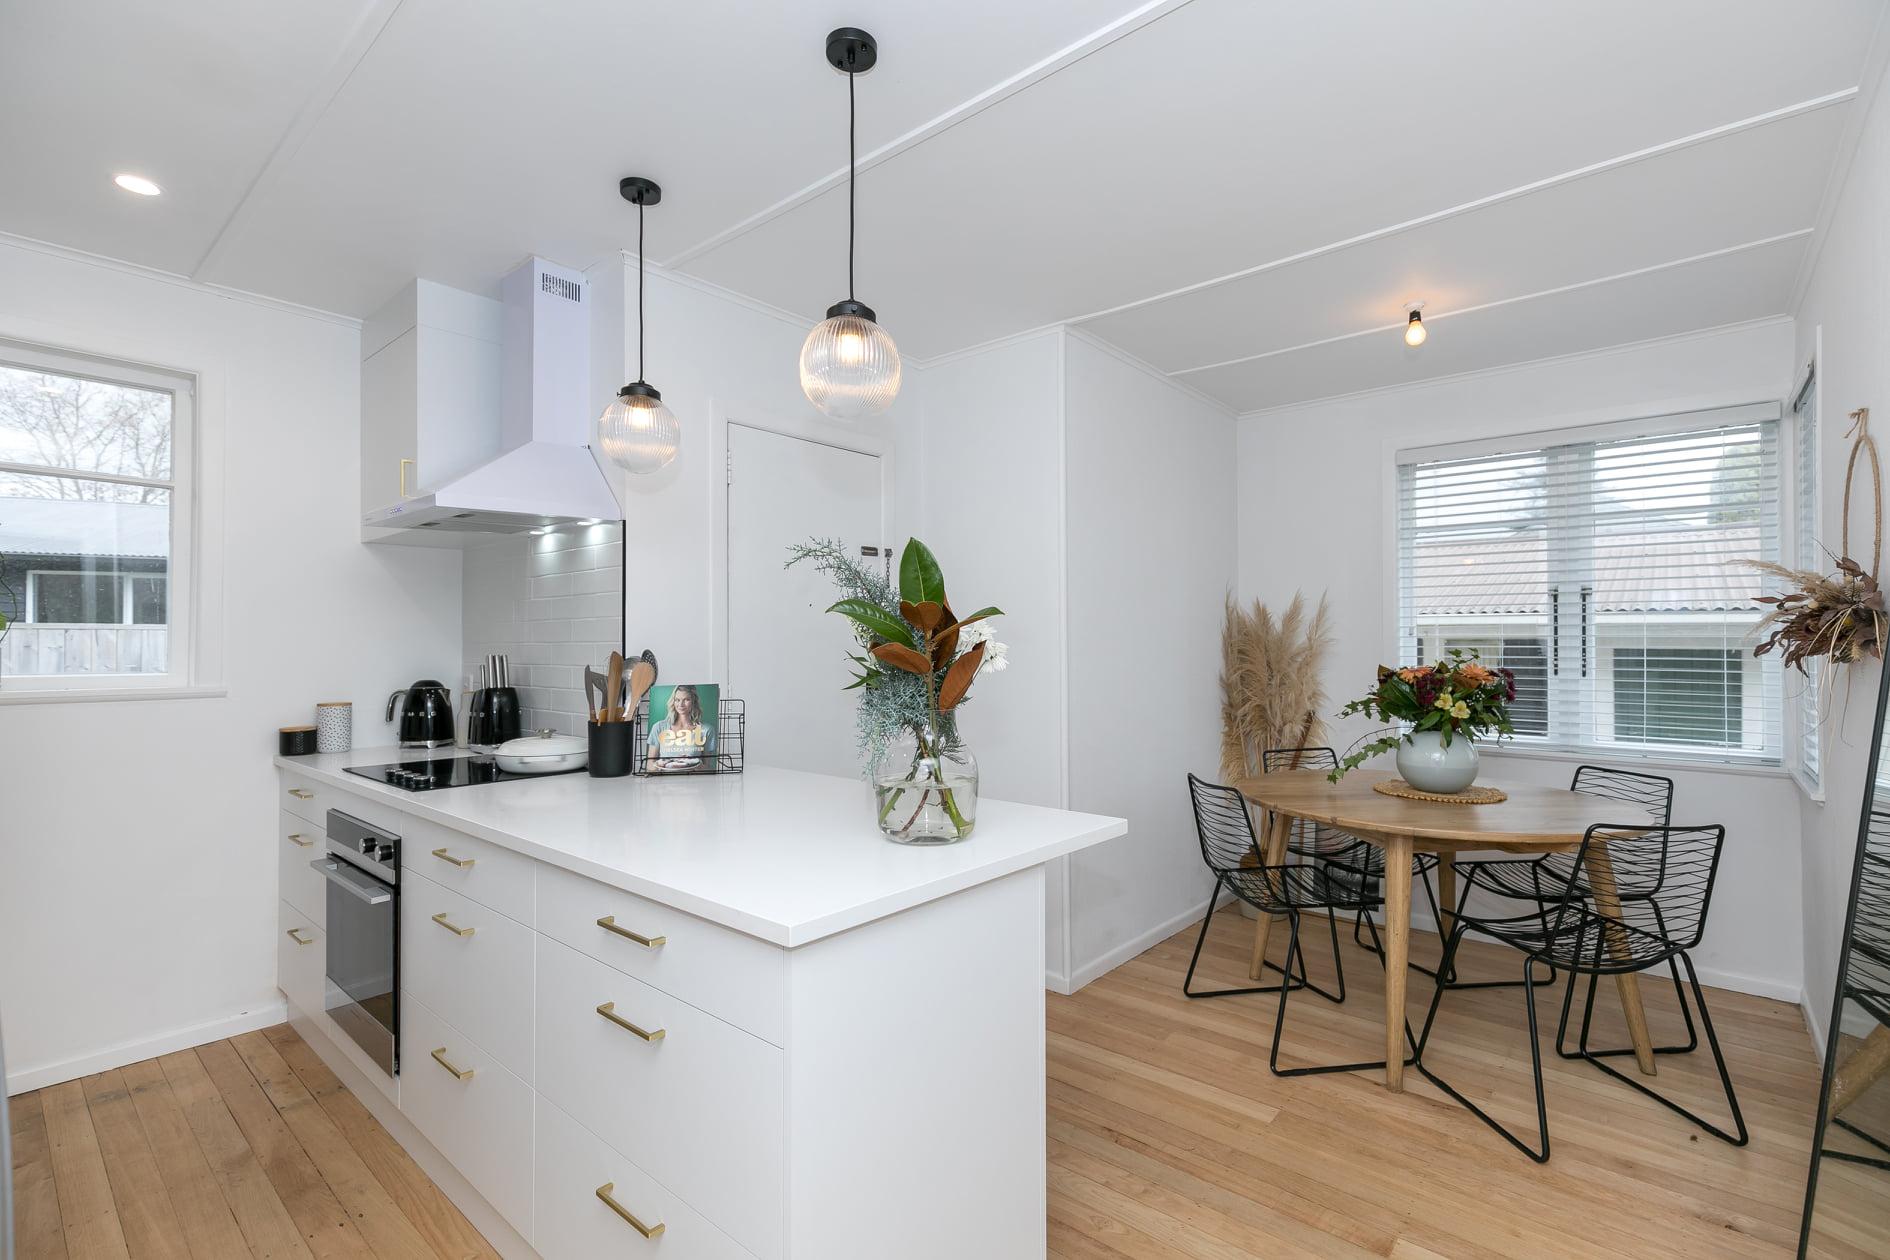 South Waikato Kitchen Renovation